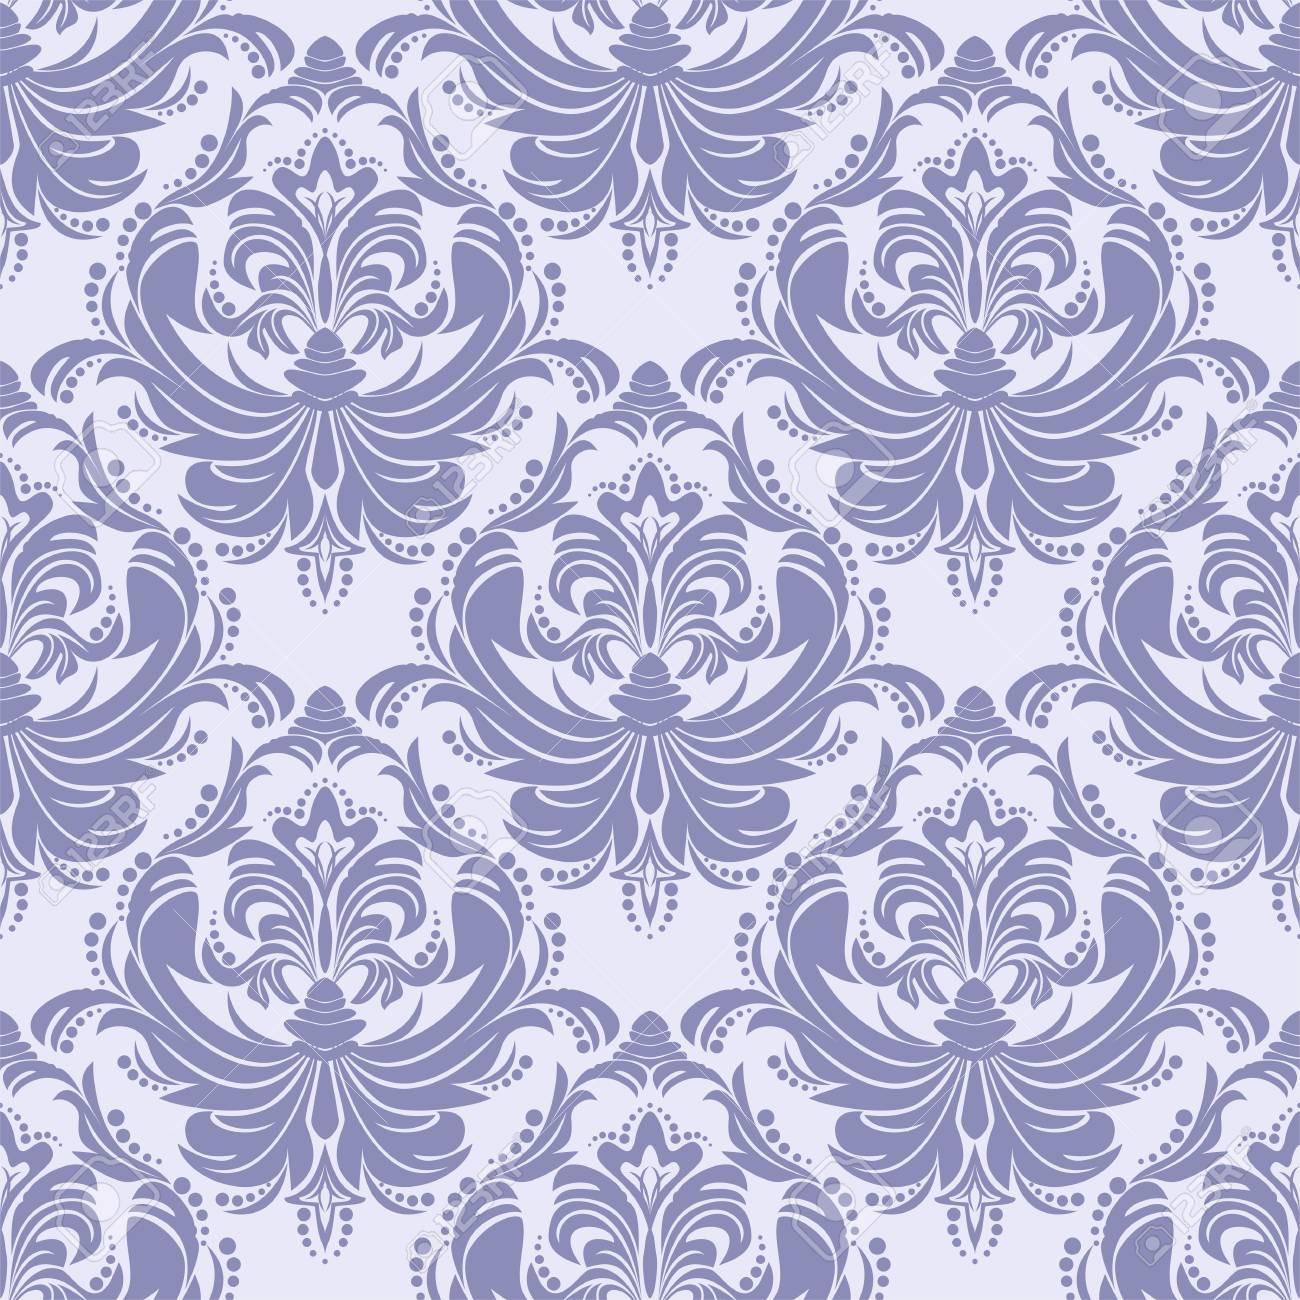 Seamless blue retro damask Wallpaper for Design - 97509769